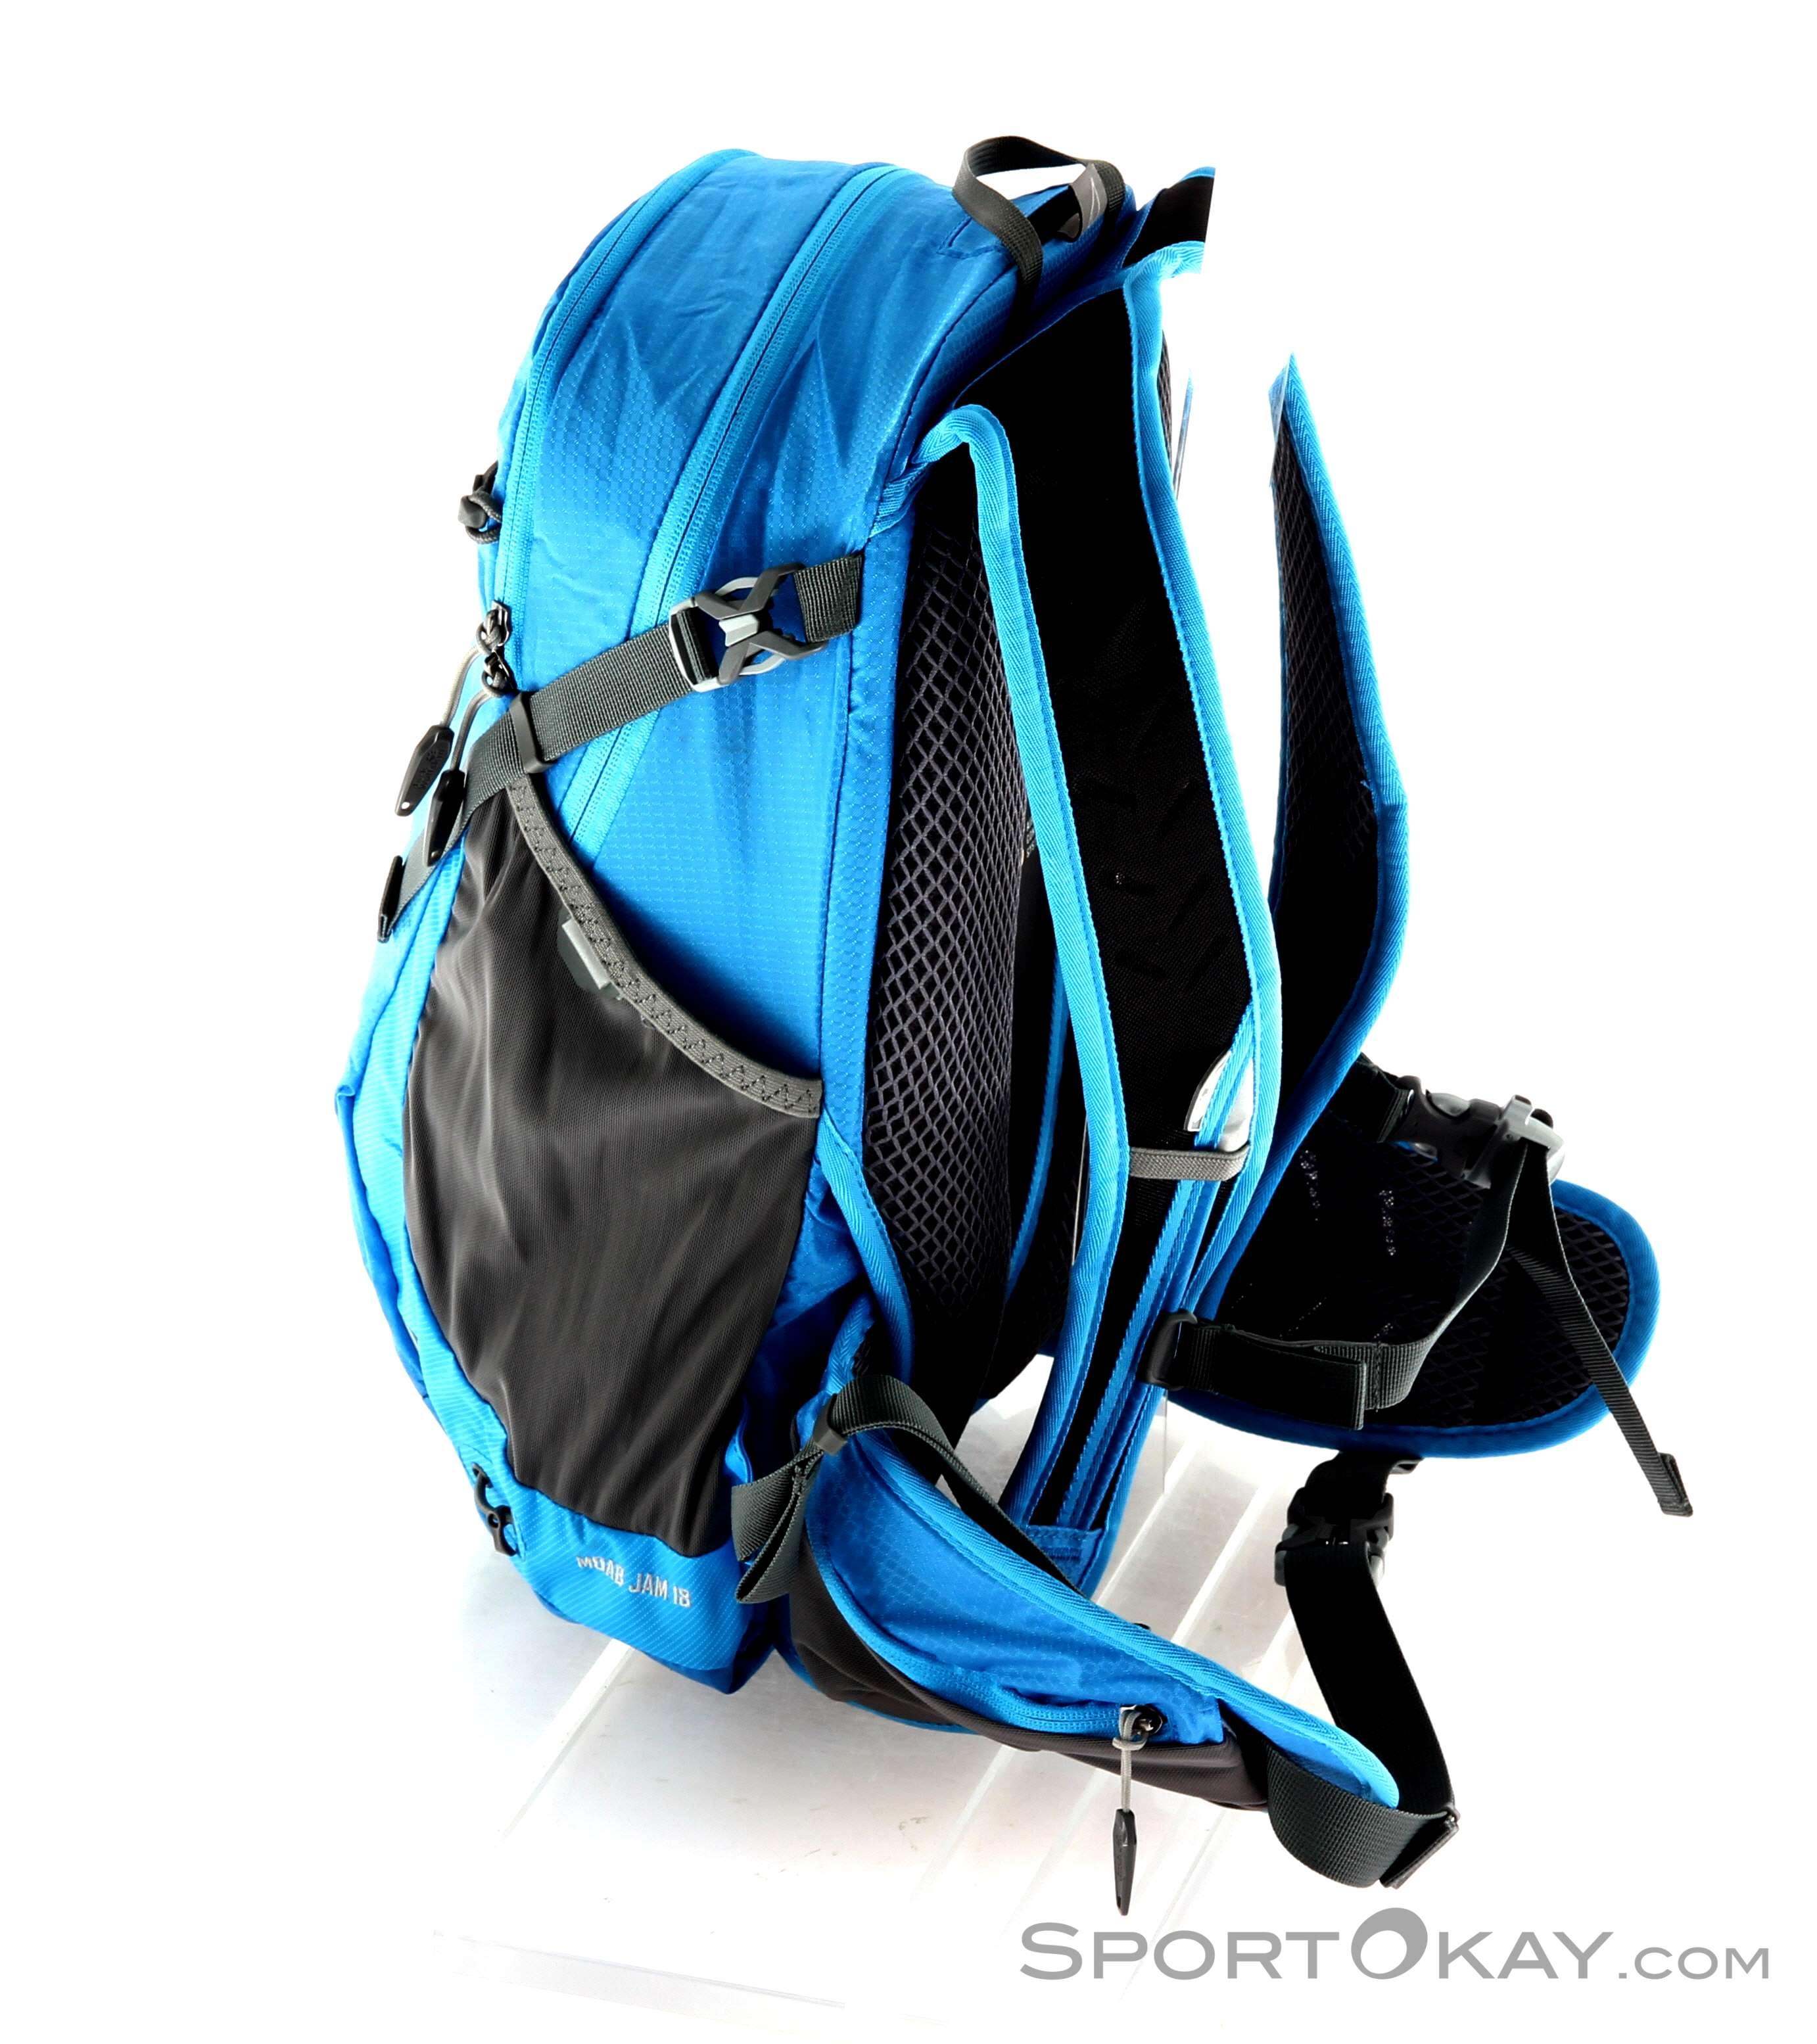 51f8aa624d0 Jack Wolfskin Moab Jam 18l Backpack, Jack Wolfskin, Blue, , Unisex, 0230